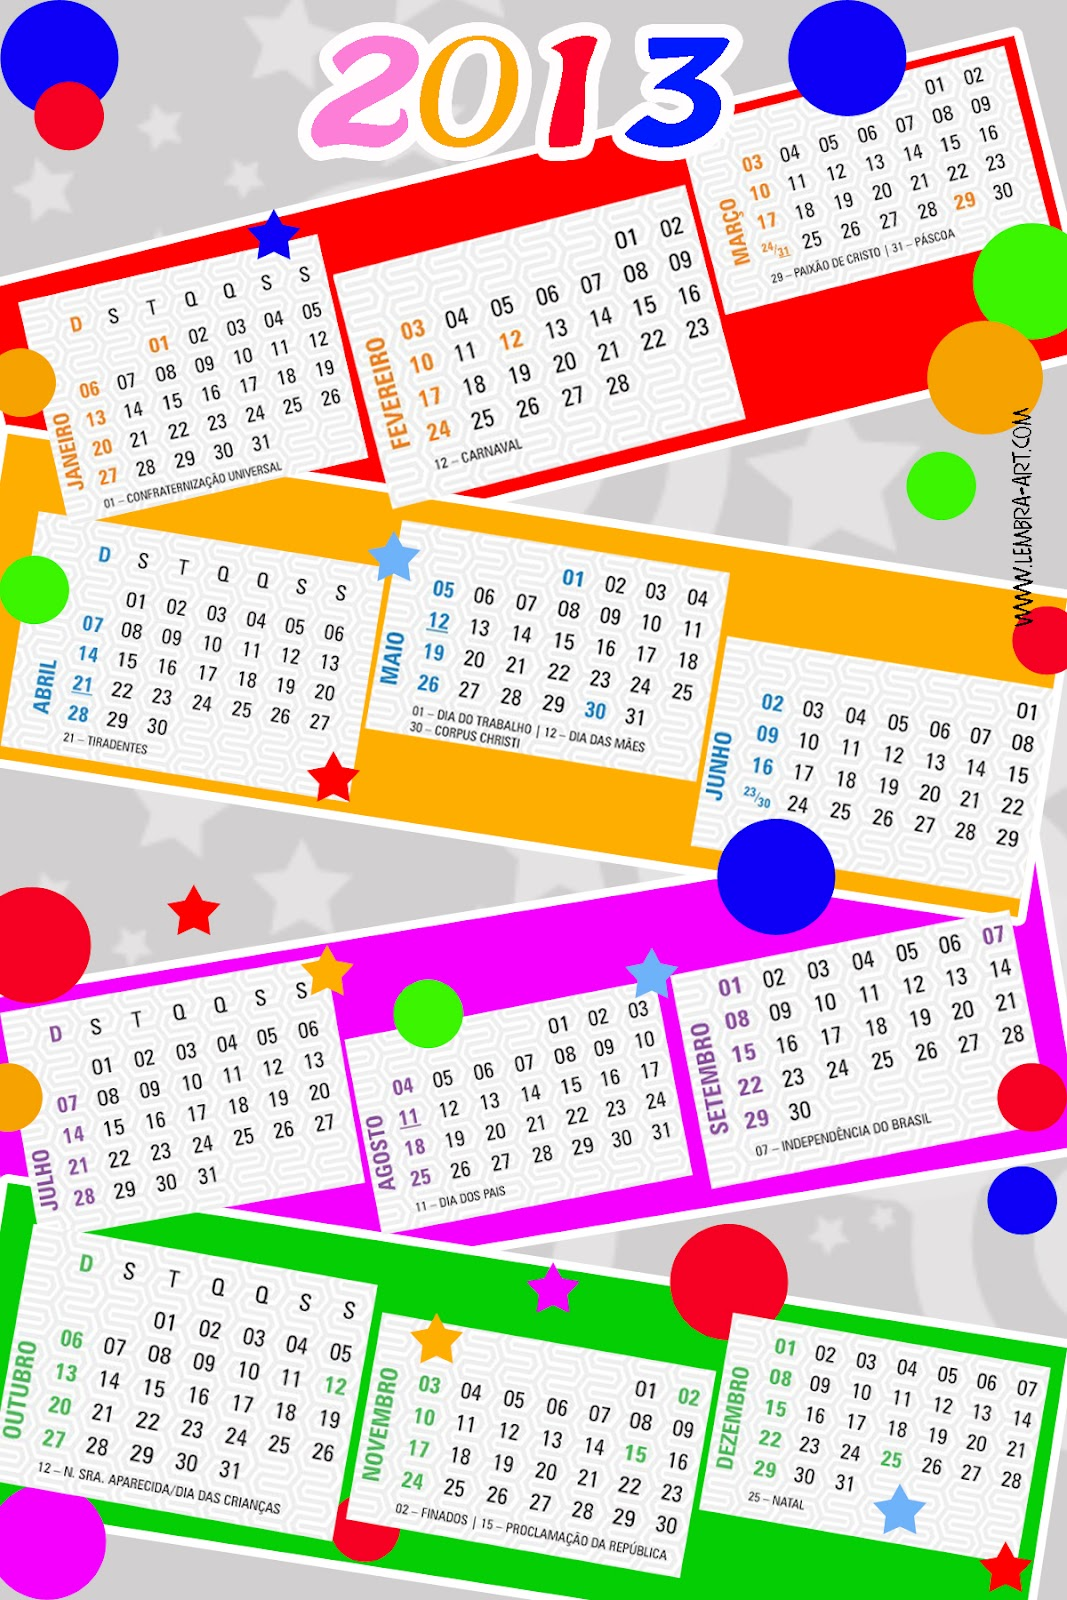 ... tera rapidamente um calendario de 2013 calendario 2013 para imprimir